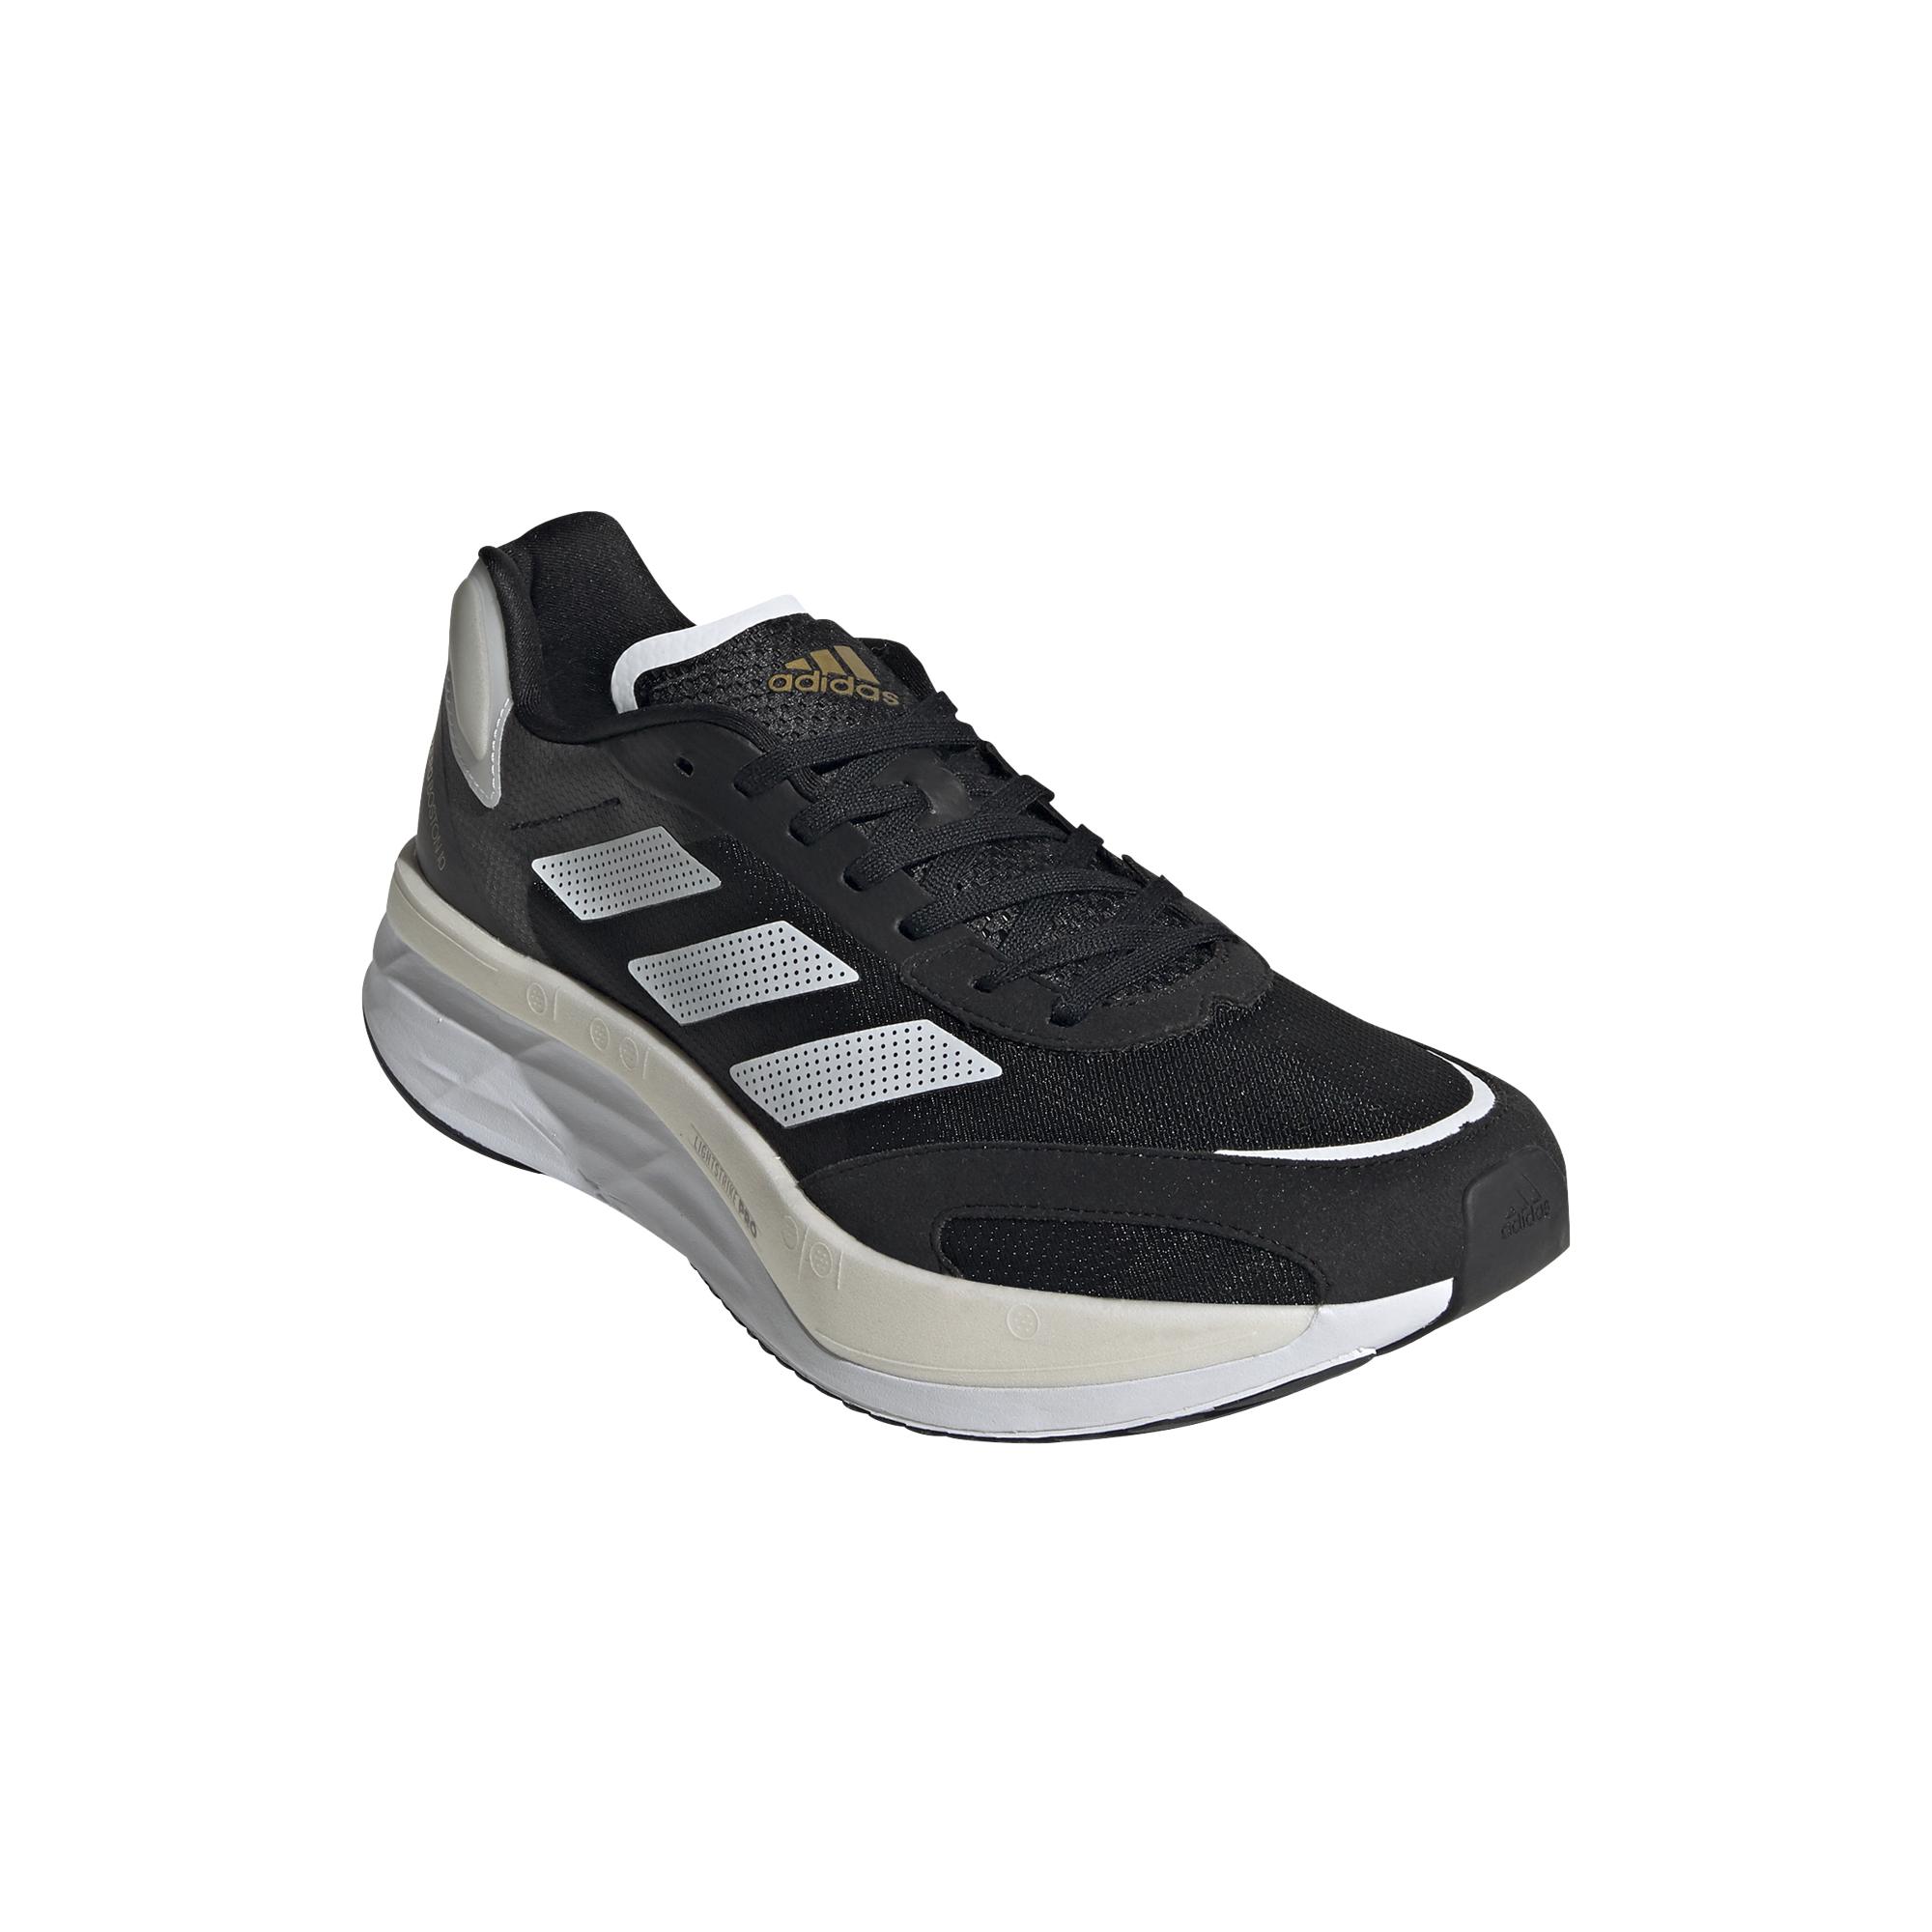 Men's Adidas Adizero Boston 10 Running Shoe - Color: Core Black / Cloud White / Gold Metallic - Size: 6.5 - Width: Regular, Core Black / Cloud White / Gold Metallic, large, image 5